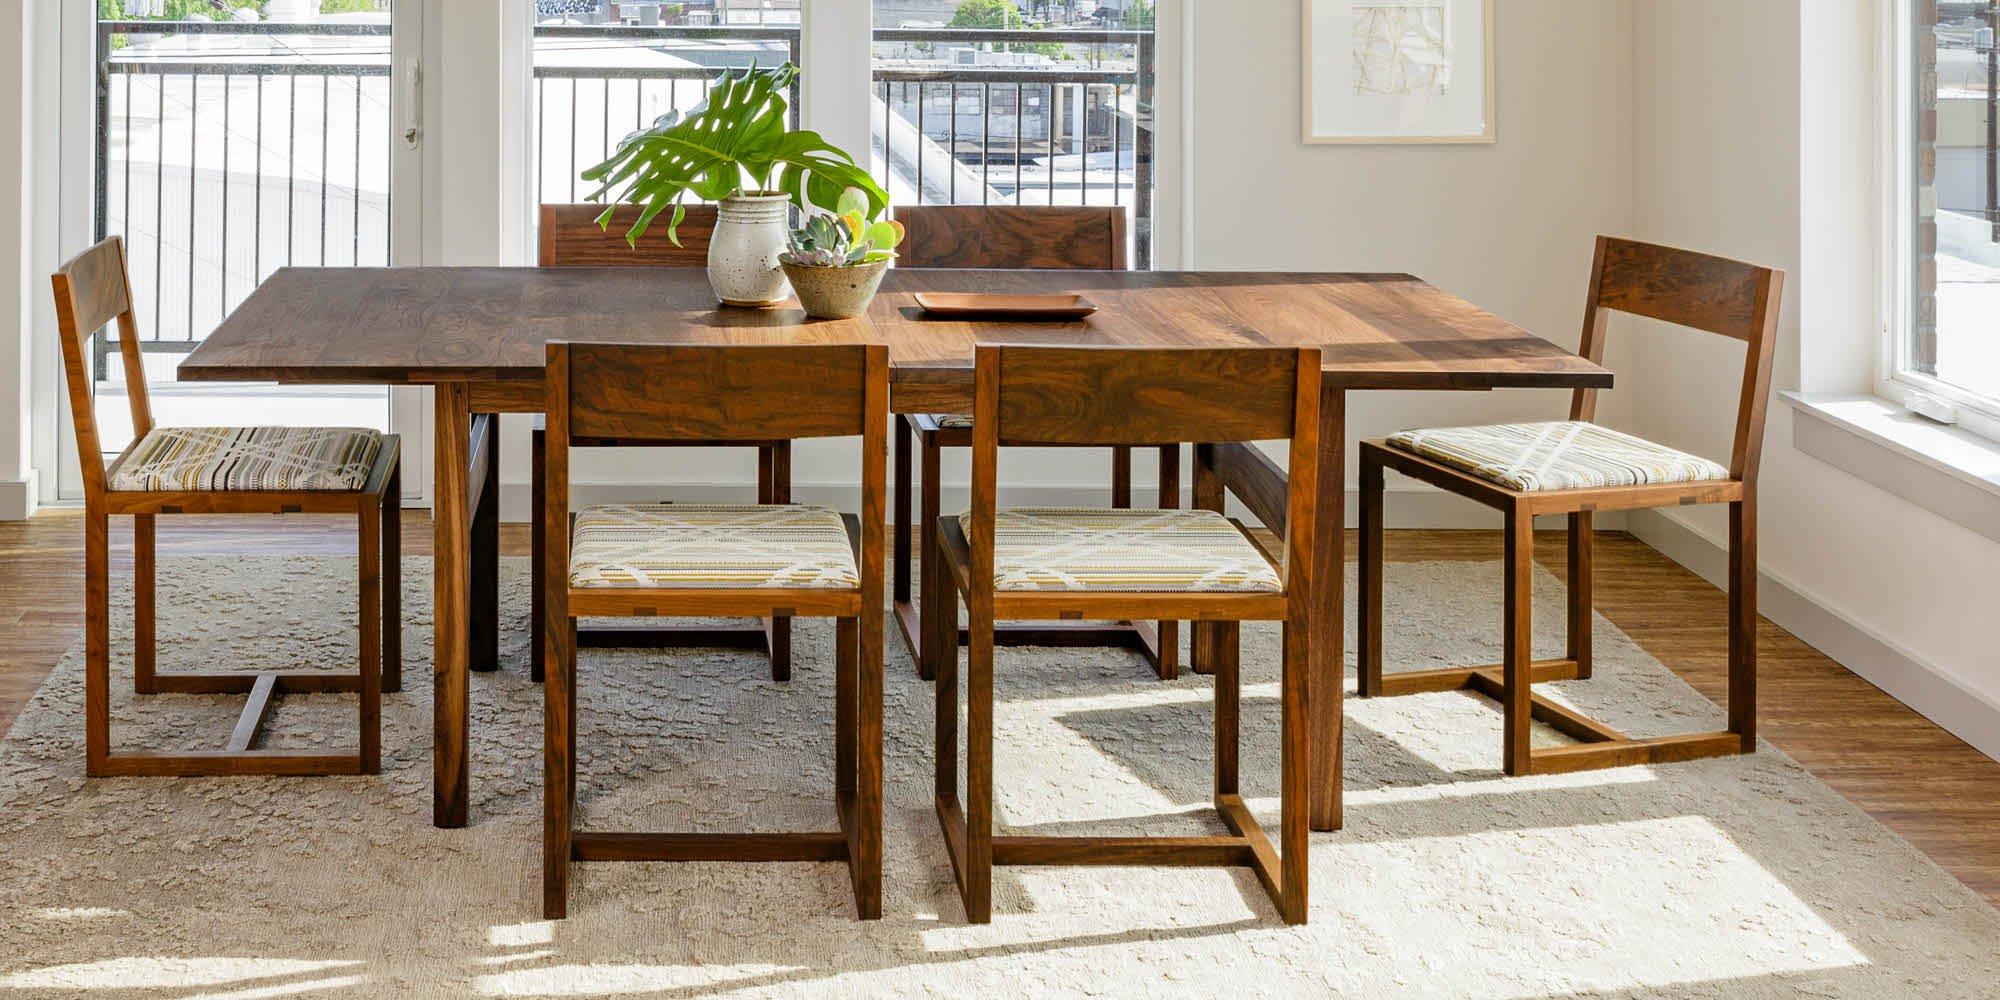 Celilo Trestle Extension dining table